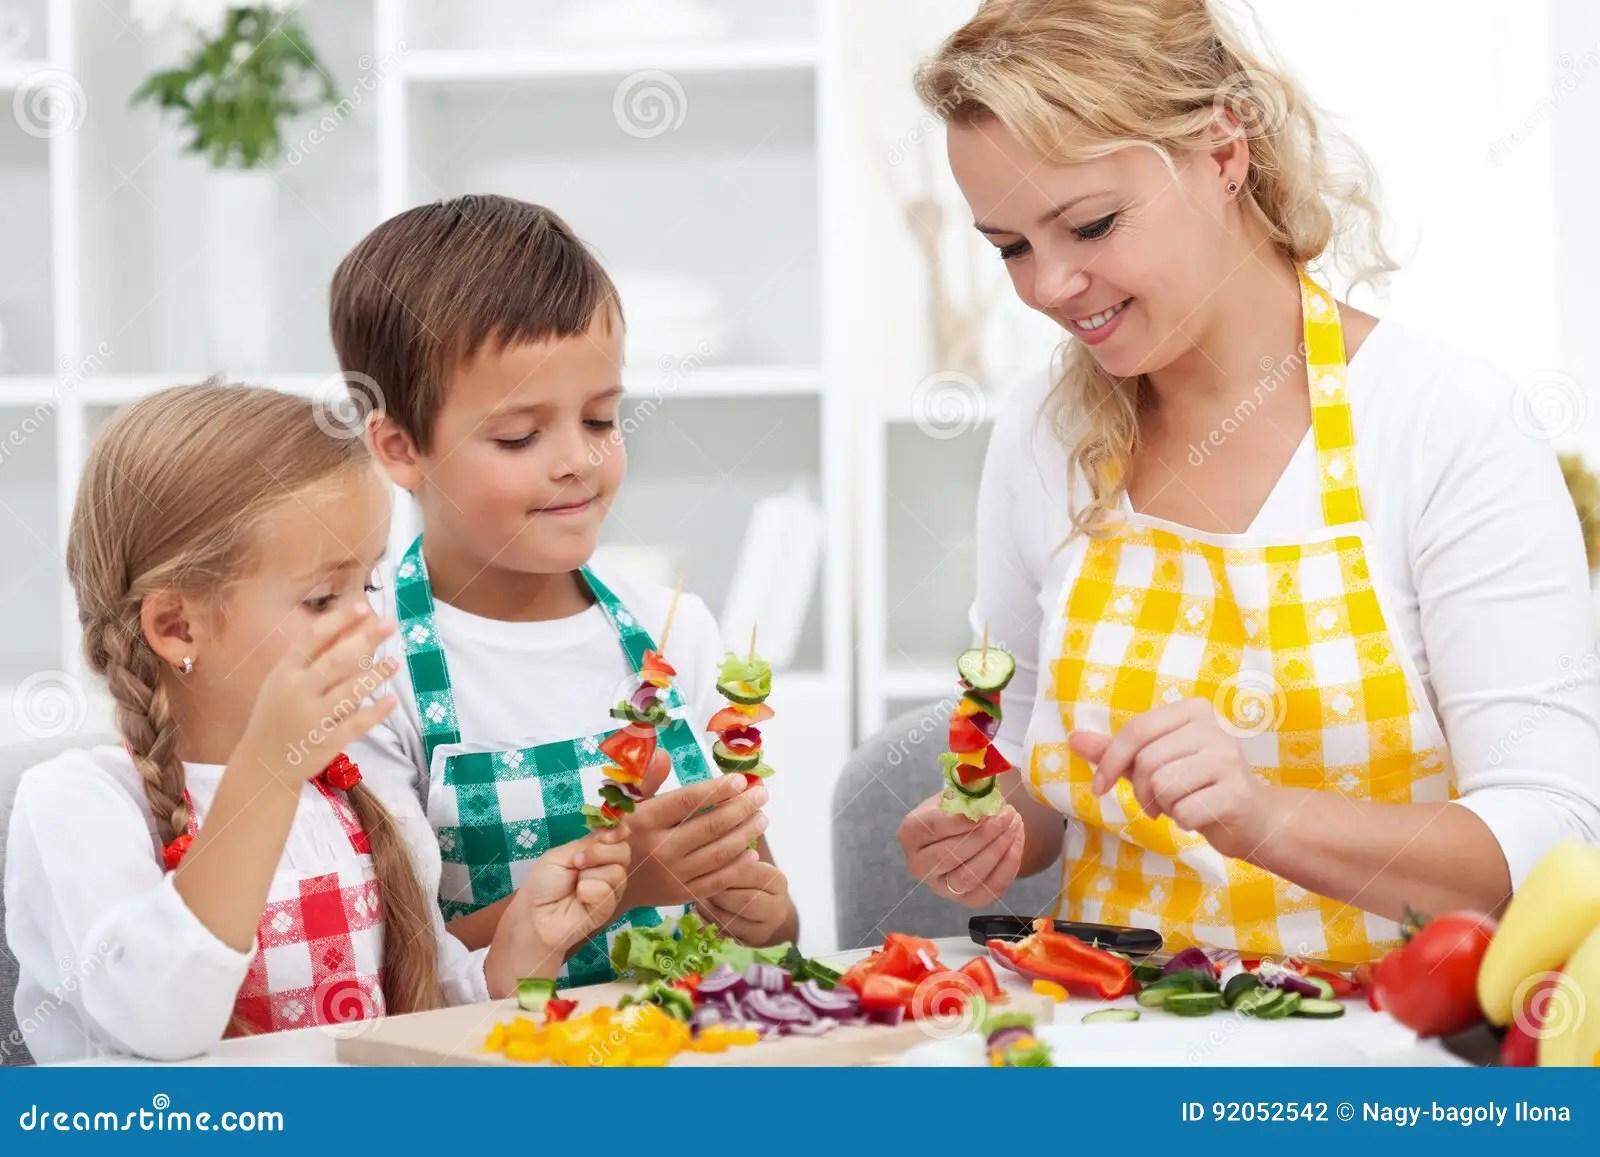 kid kitchens storage space in kitchen 与他们的母亲的小孩在厨房 准备里vegeta 库存照片 图片包括有系列 子项 与他们的母亲的小孩在准备菜快餐 健康吃概念的厨房里